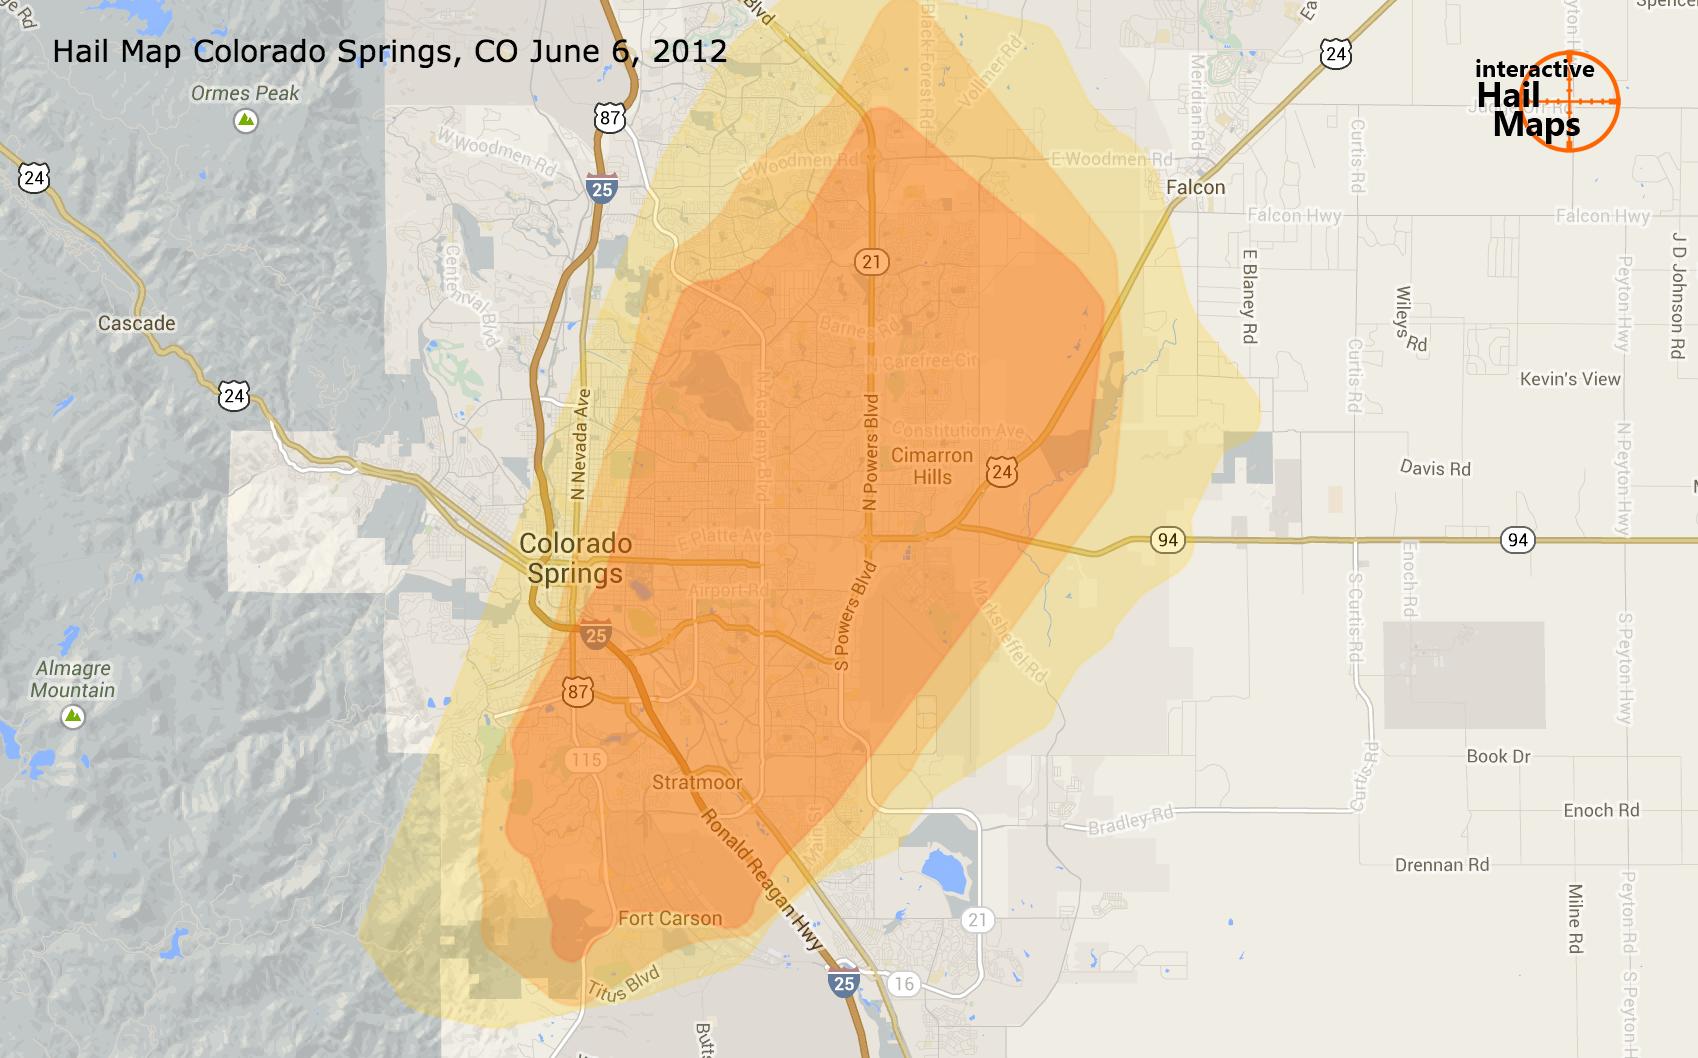 Hail Map Colorado Springs CO June 6 2012